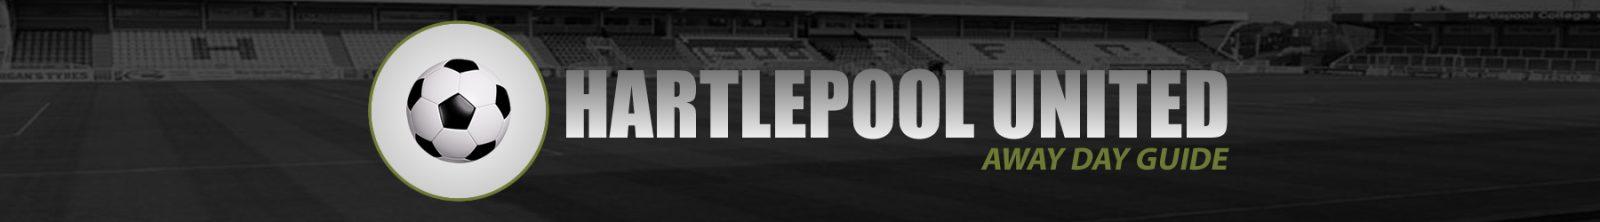 Hartlepool United Away